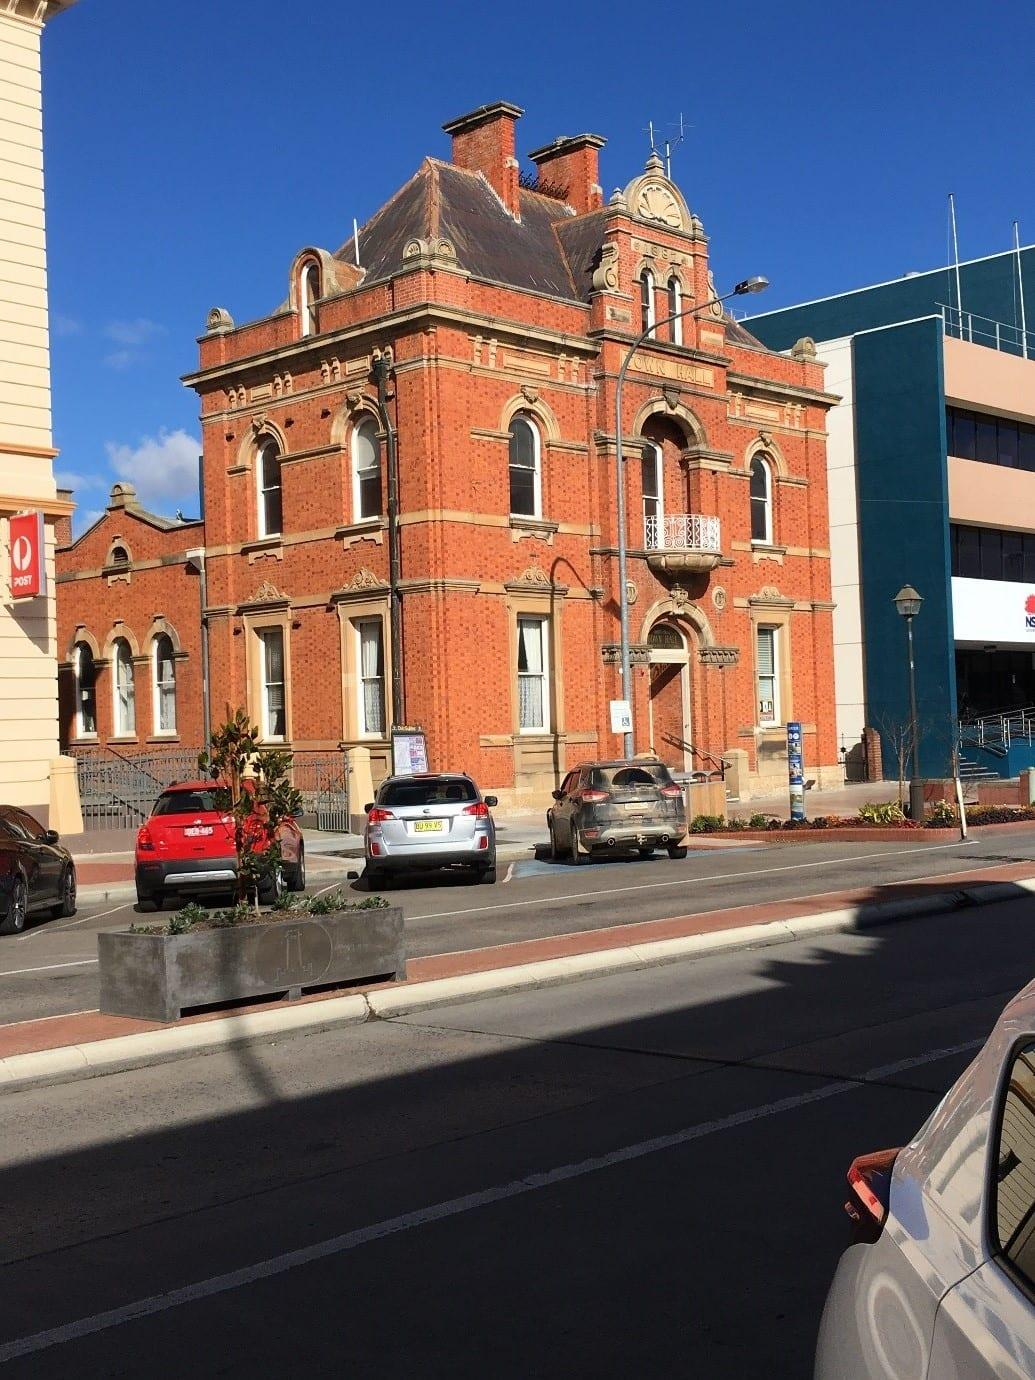 Fig.1 - Goulburn Town Hall, Goulburn - NSW, Australia